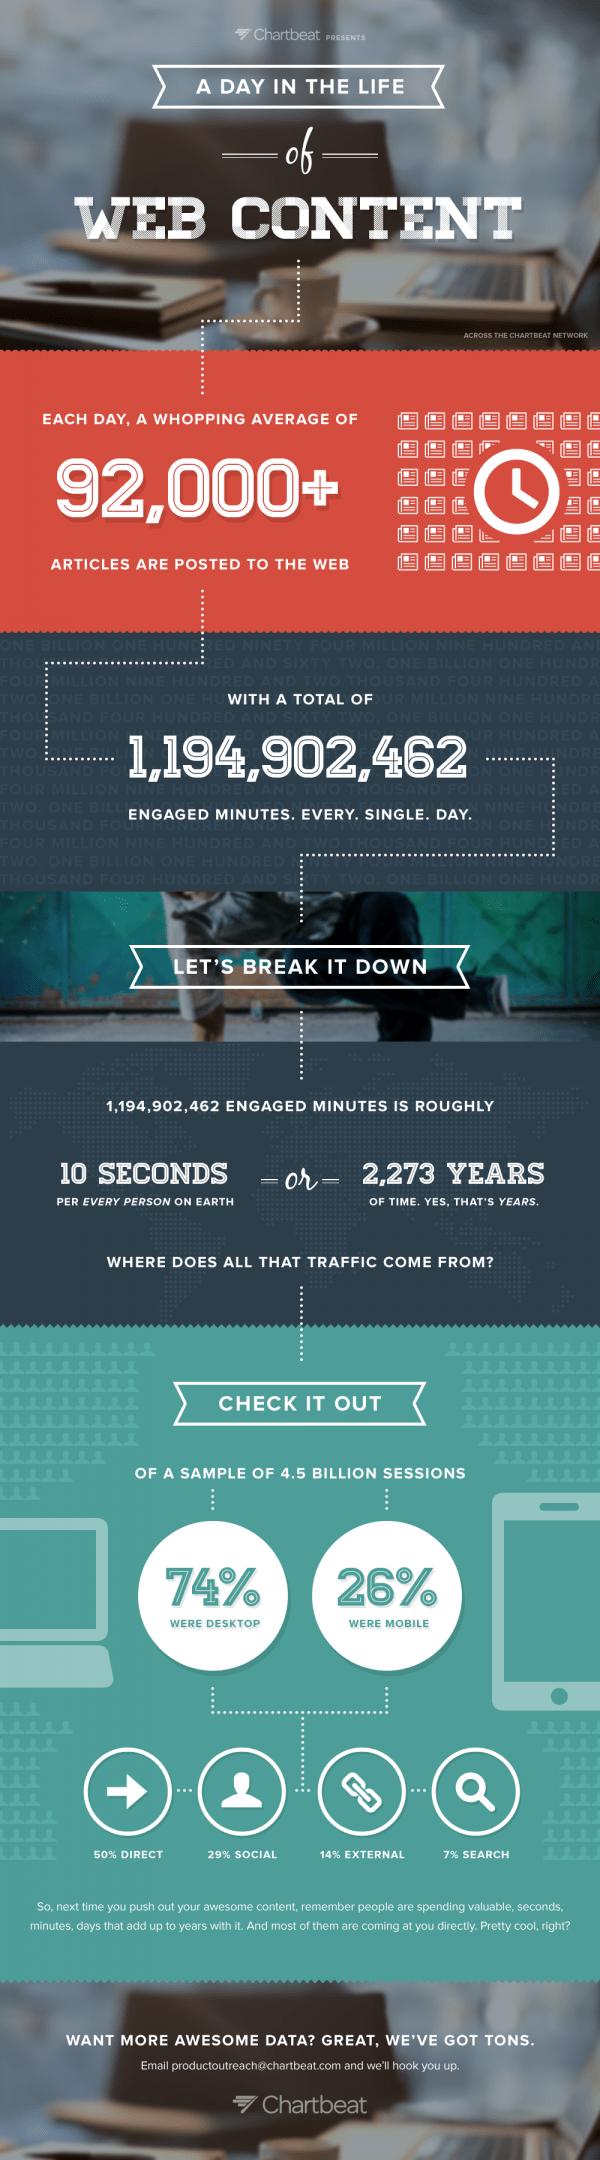 mockup-infographic-v4